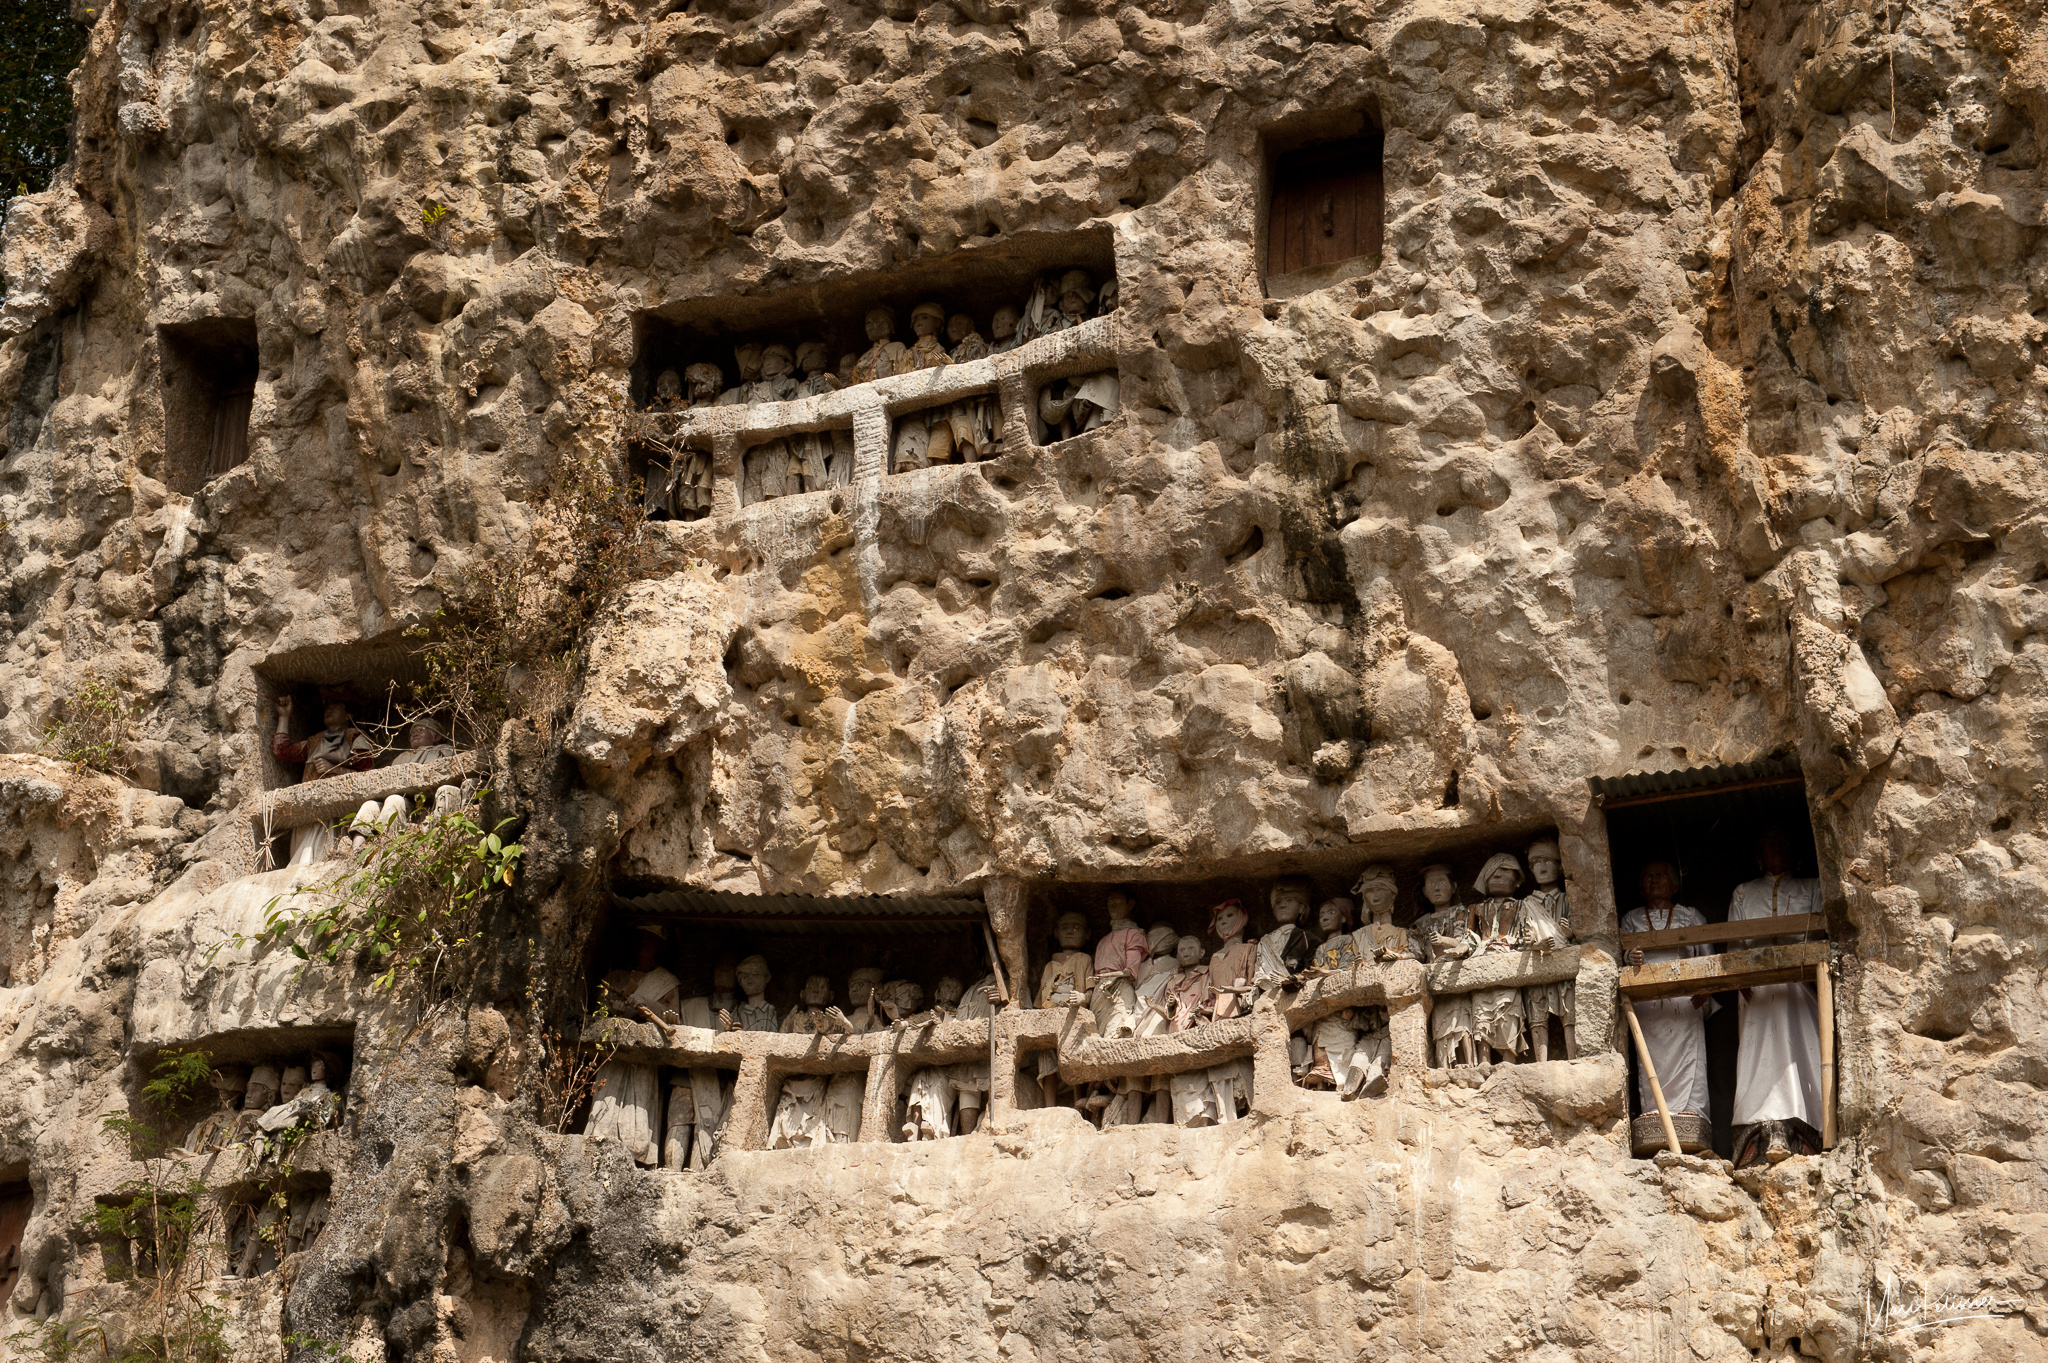 Suaya cliff tomb & mummy, Indonesia